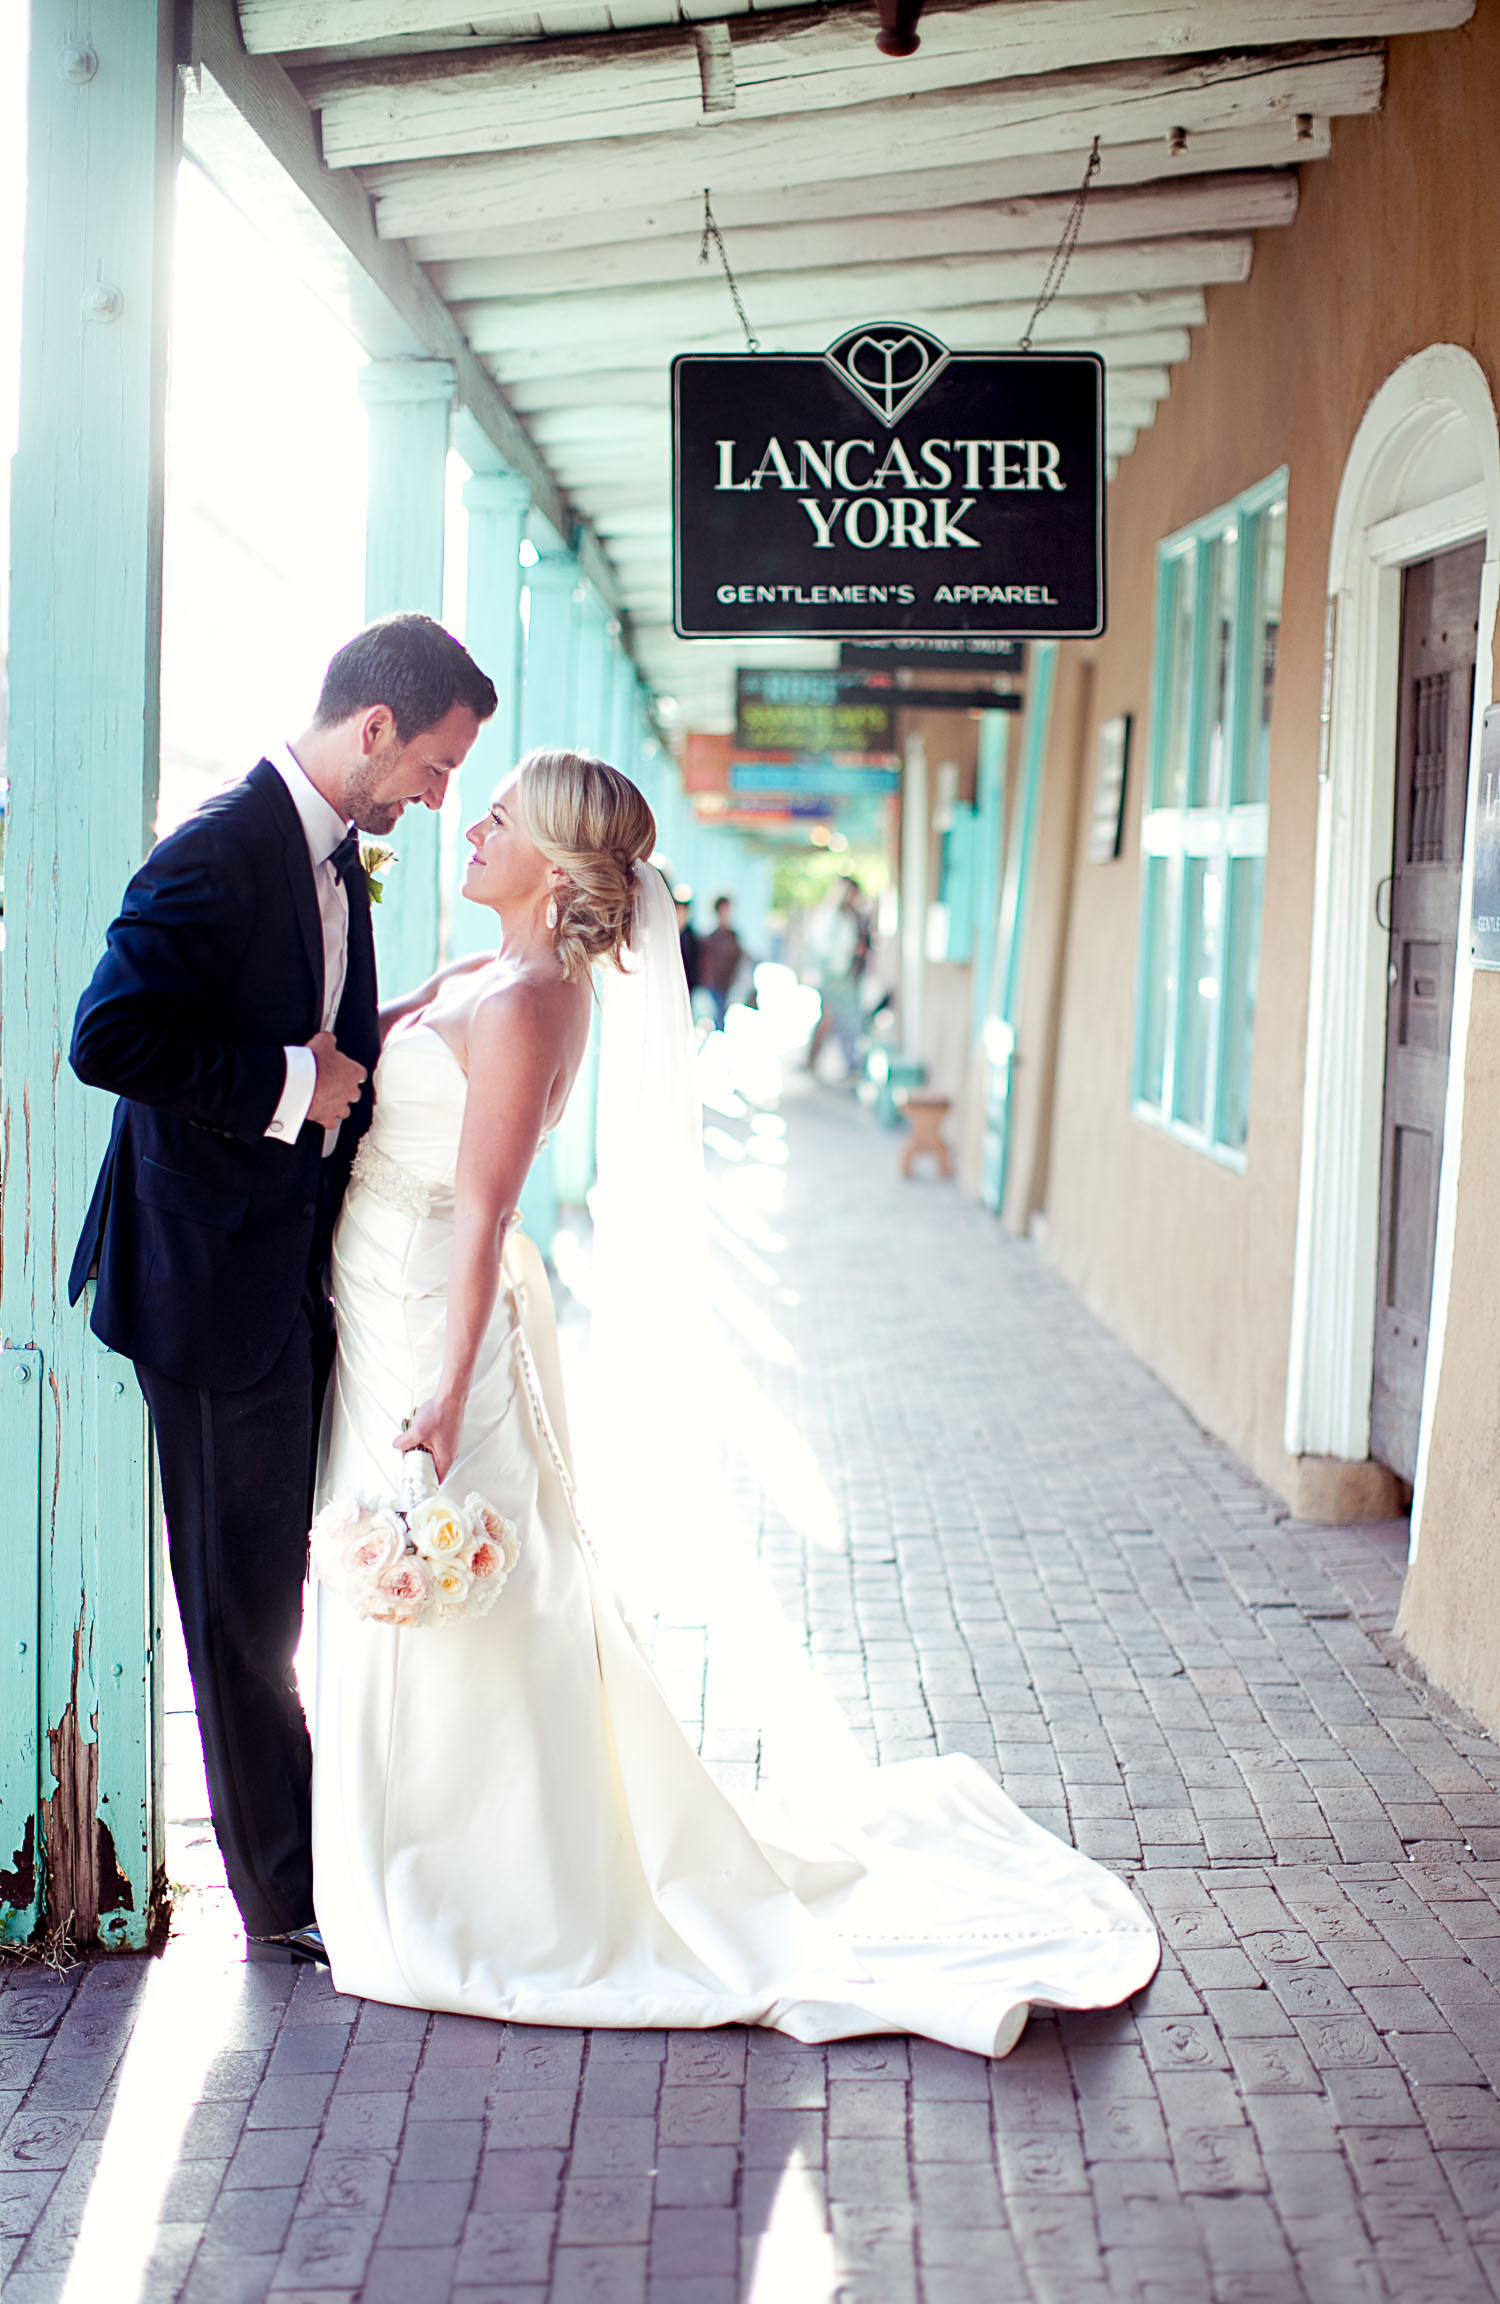 JMPHOTOART-Wedding-Photographer-104.jpg